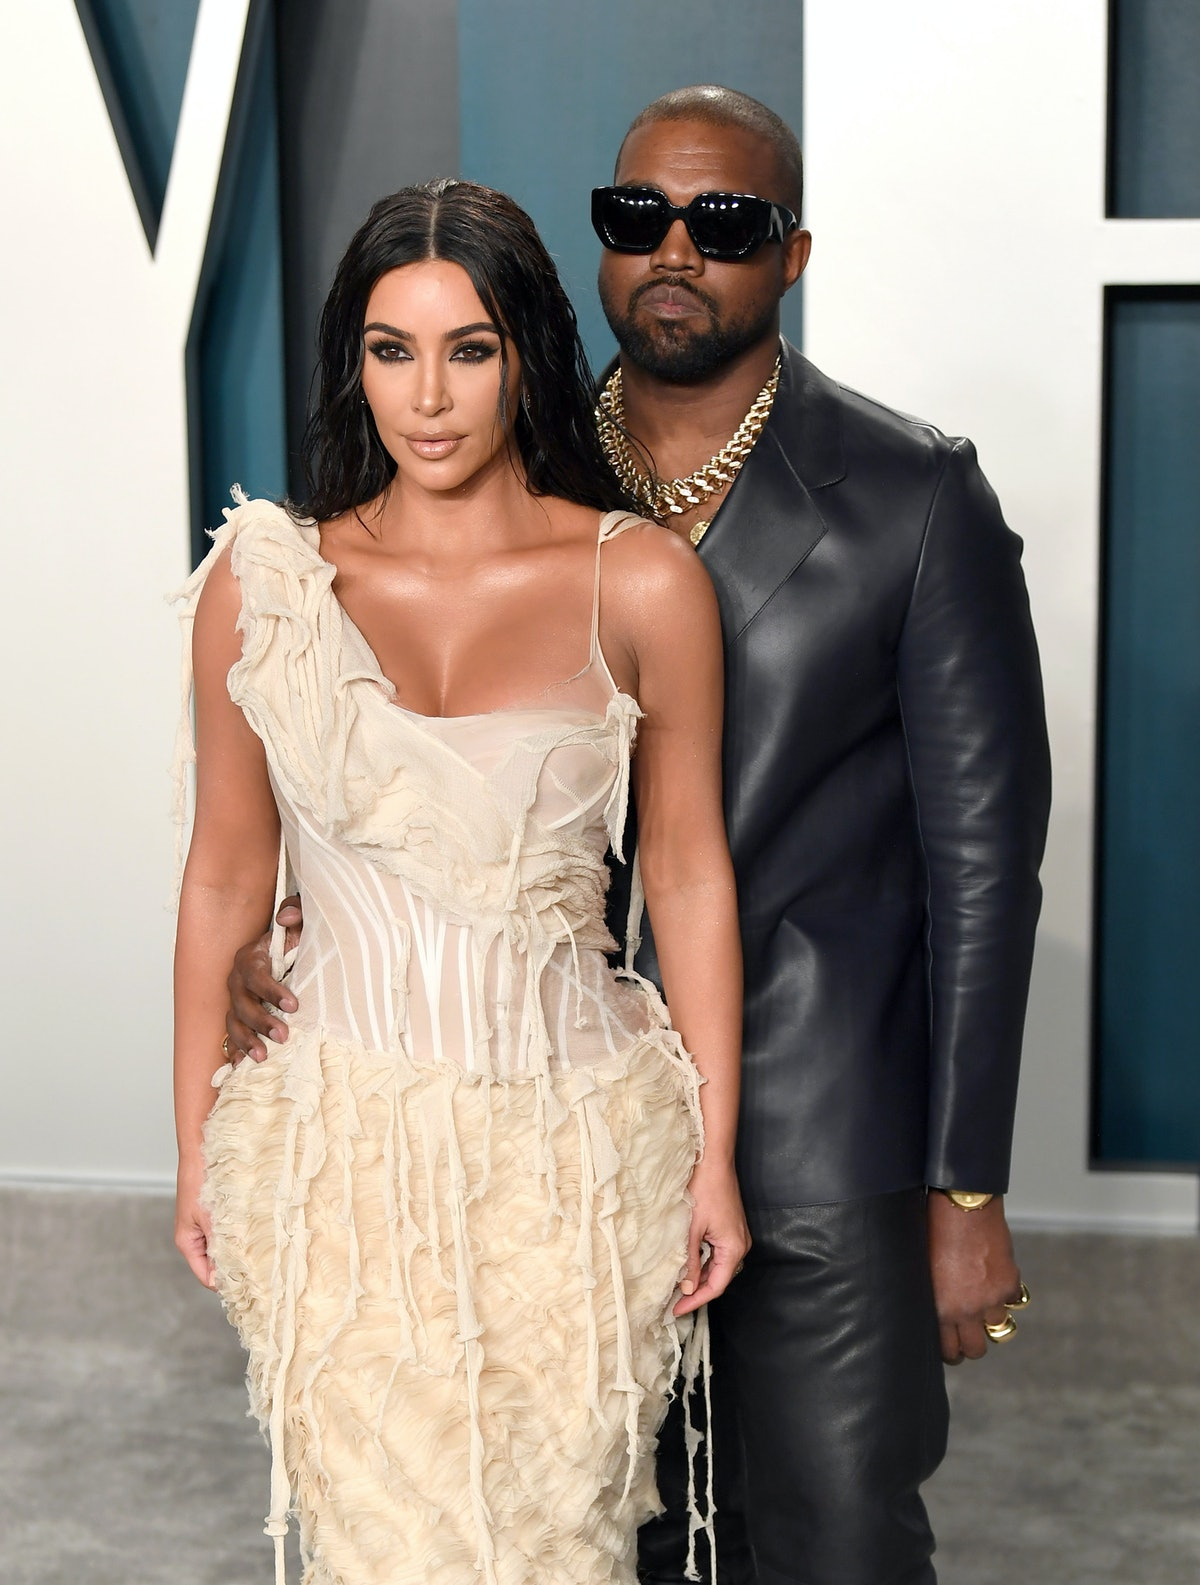 BEVERLY HILLS, CALIFORNIA - FEBRUARY 09: Kim Kardashian and Kanye West attend the 2020 Vanity Fair O...